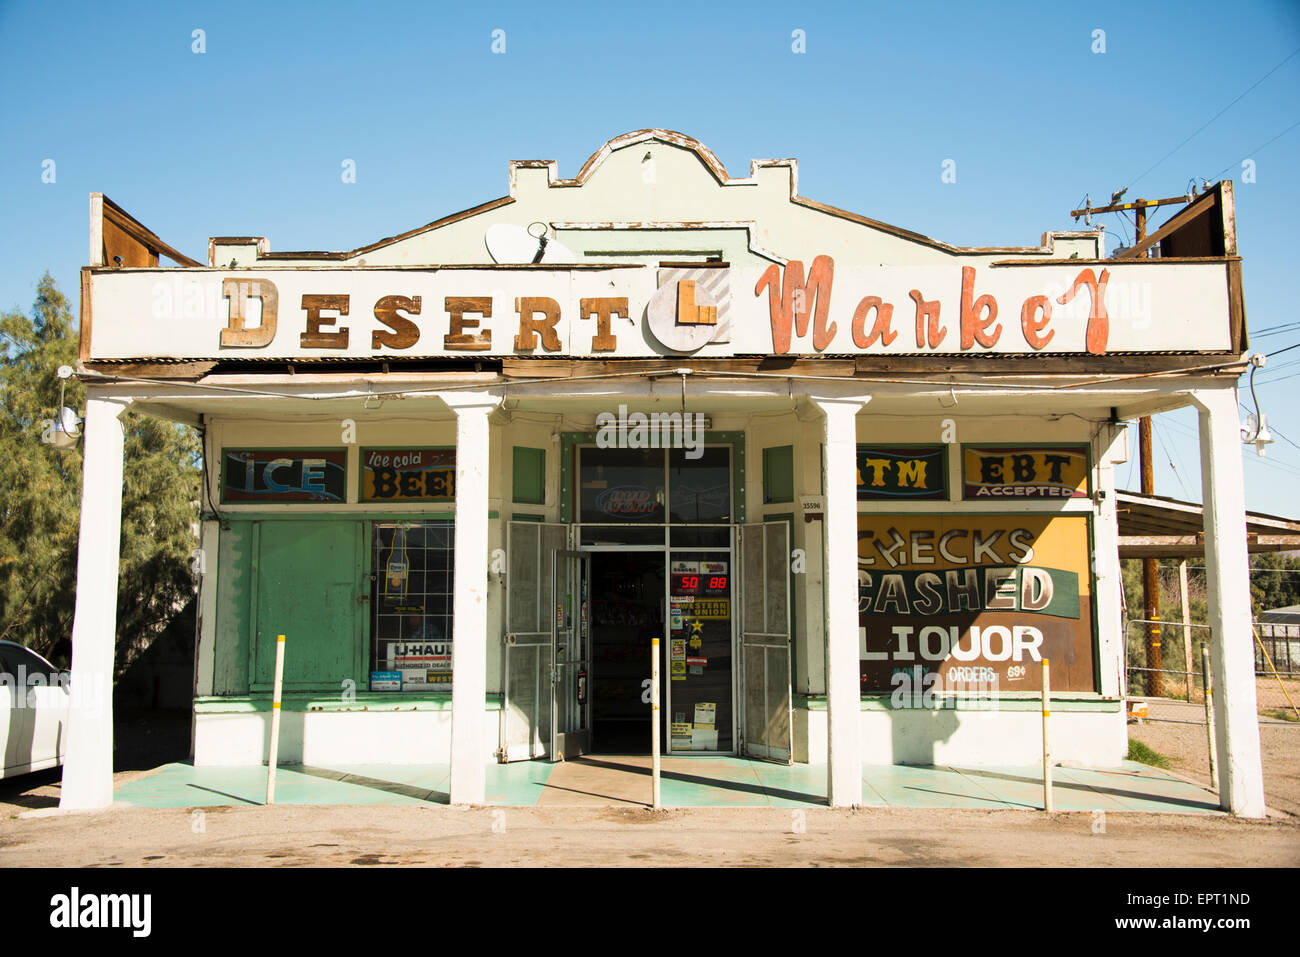 General Store in town of Daggett in San Bernadino County California on Route 66 USA Stock Photo